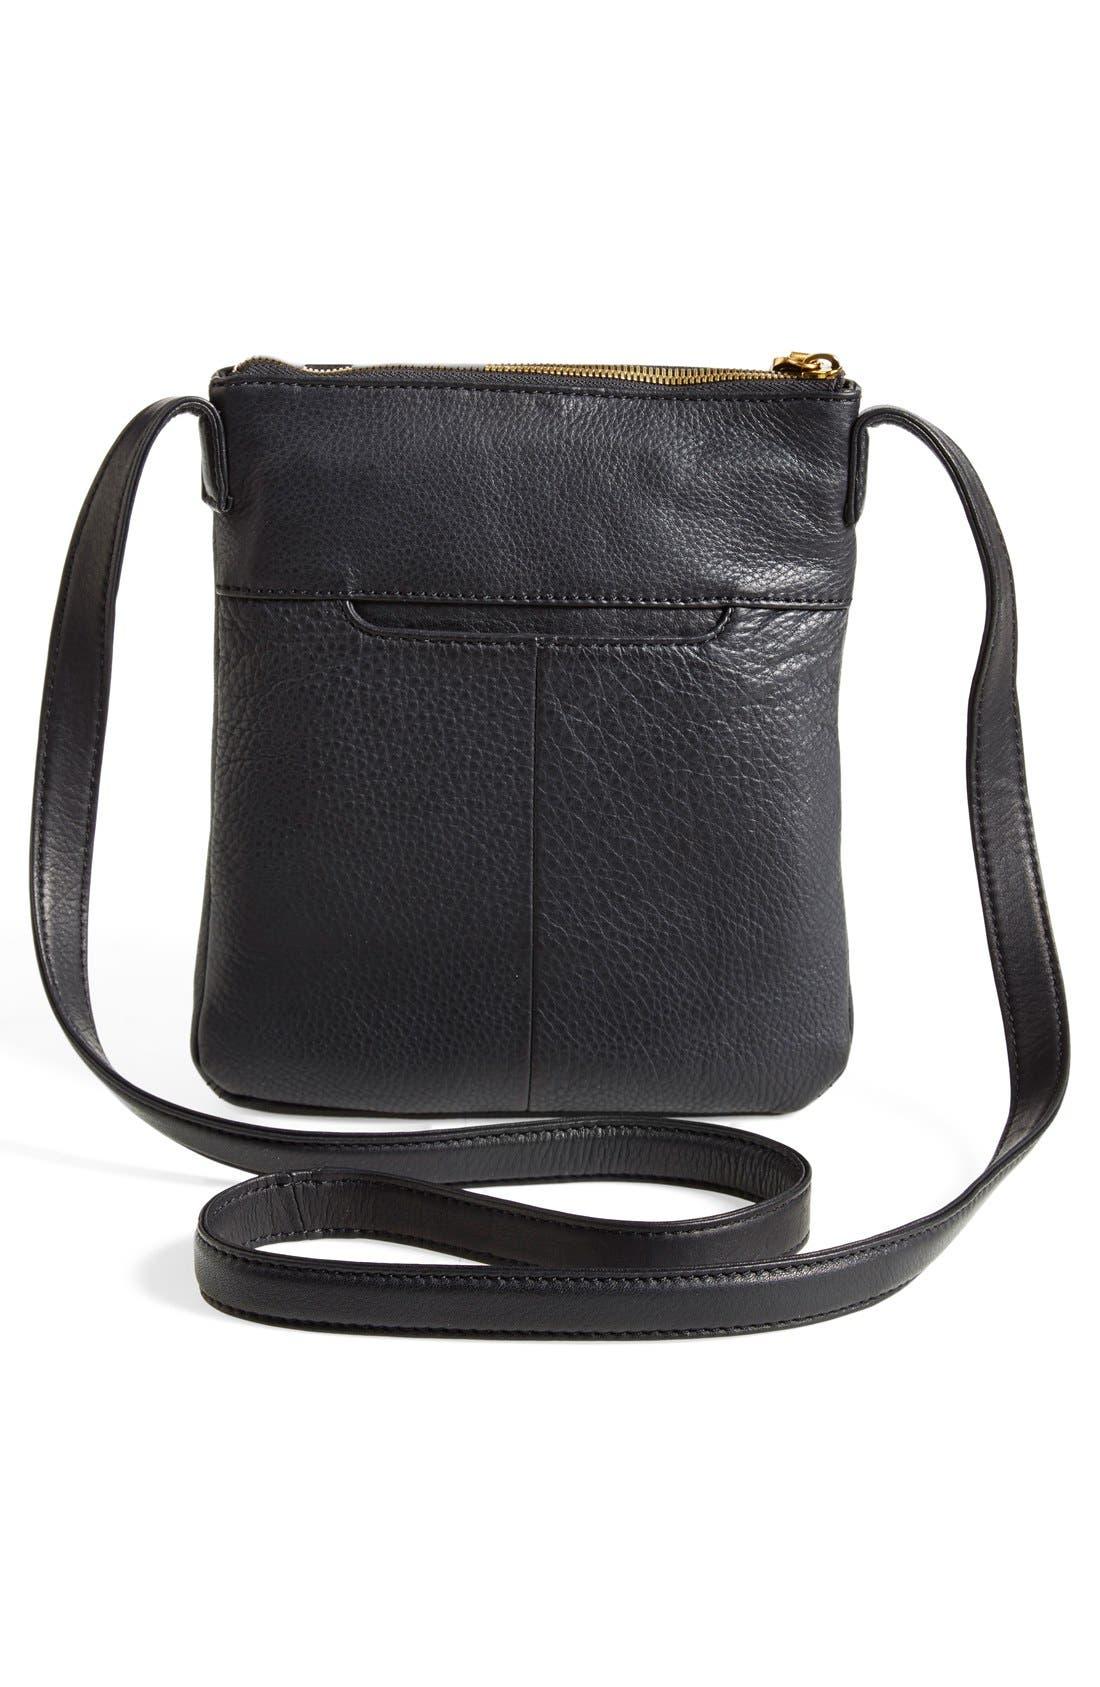 'Sarah' Leather Crossbody Bag,                             Alternate thumbnail 23, color,